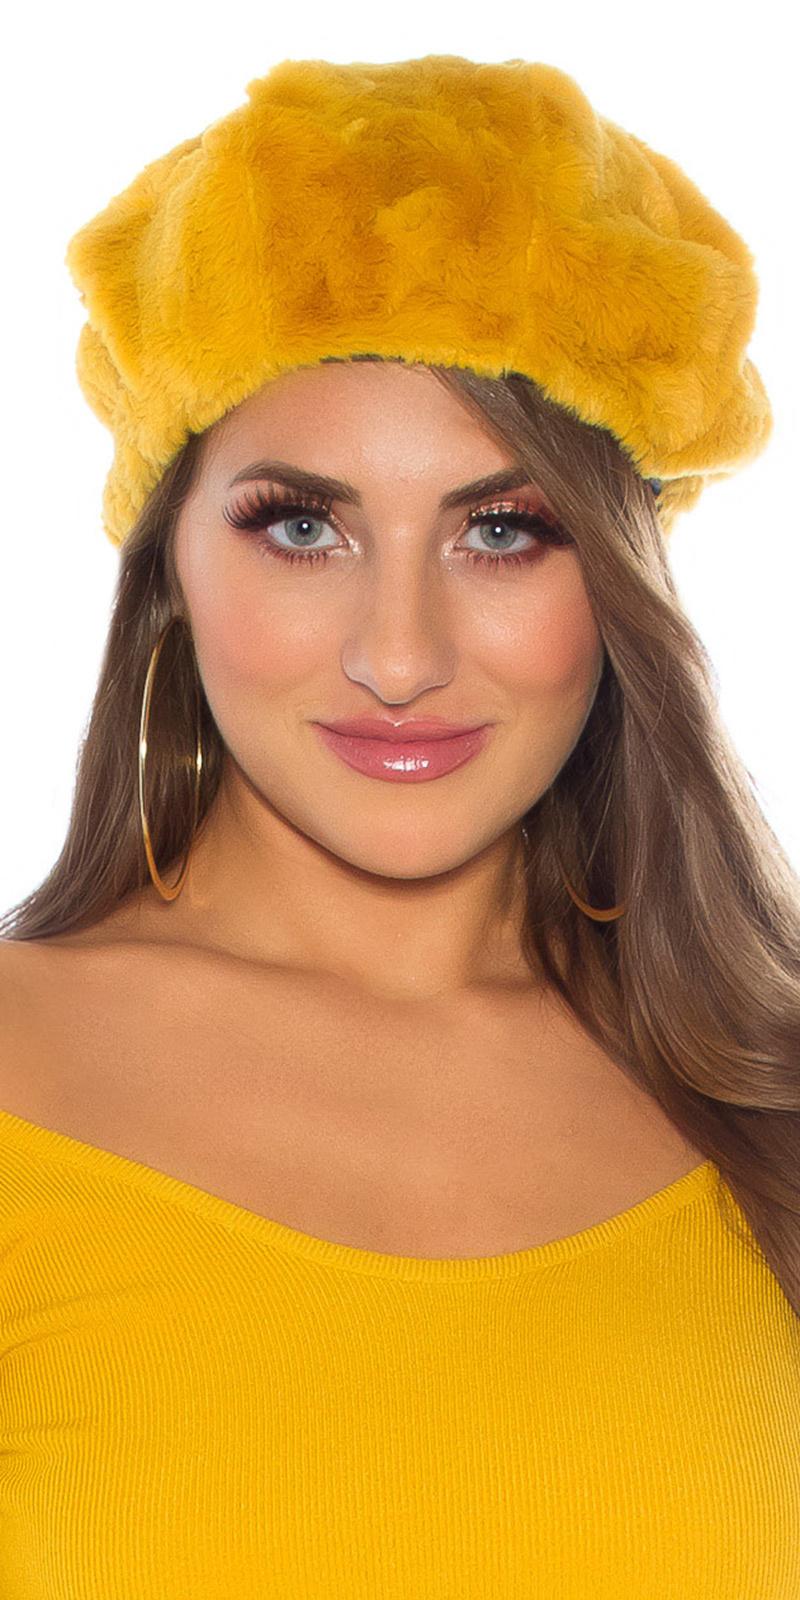 Trendy pluizige hat - beanie mosterdgeel